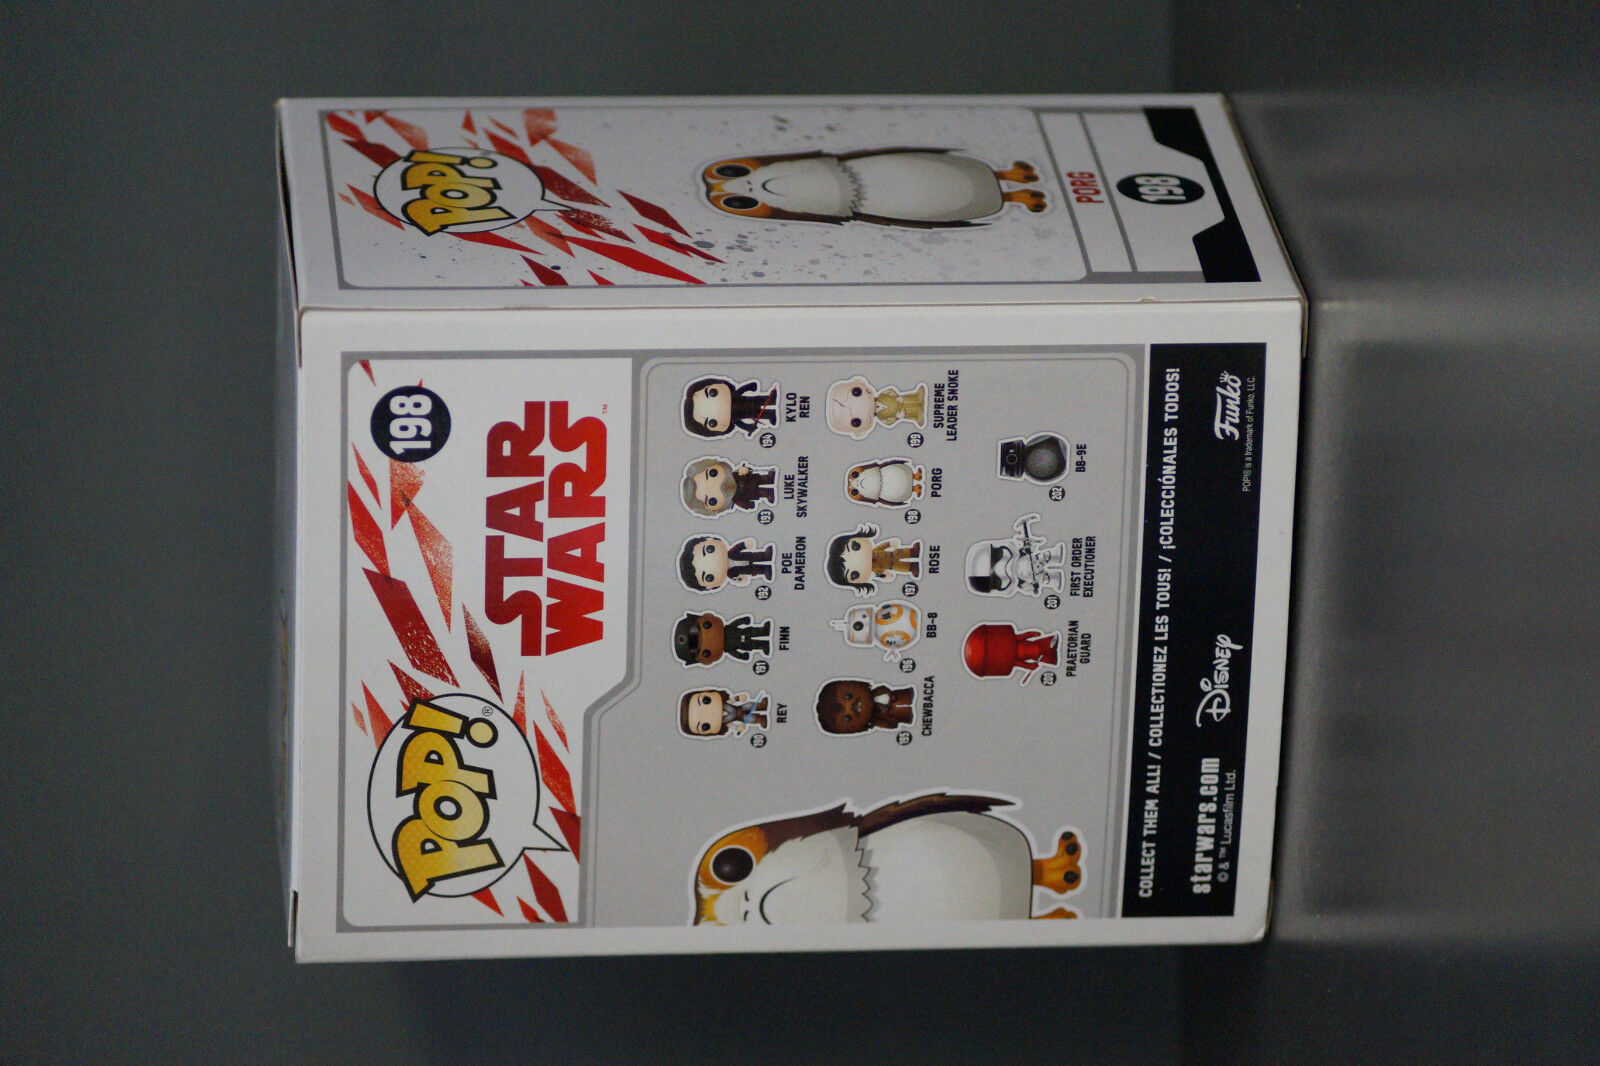 FUNKO POP STAR WARS WARS WARS porg 198 NEU OVP chase limited edition 07eb74